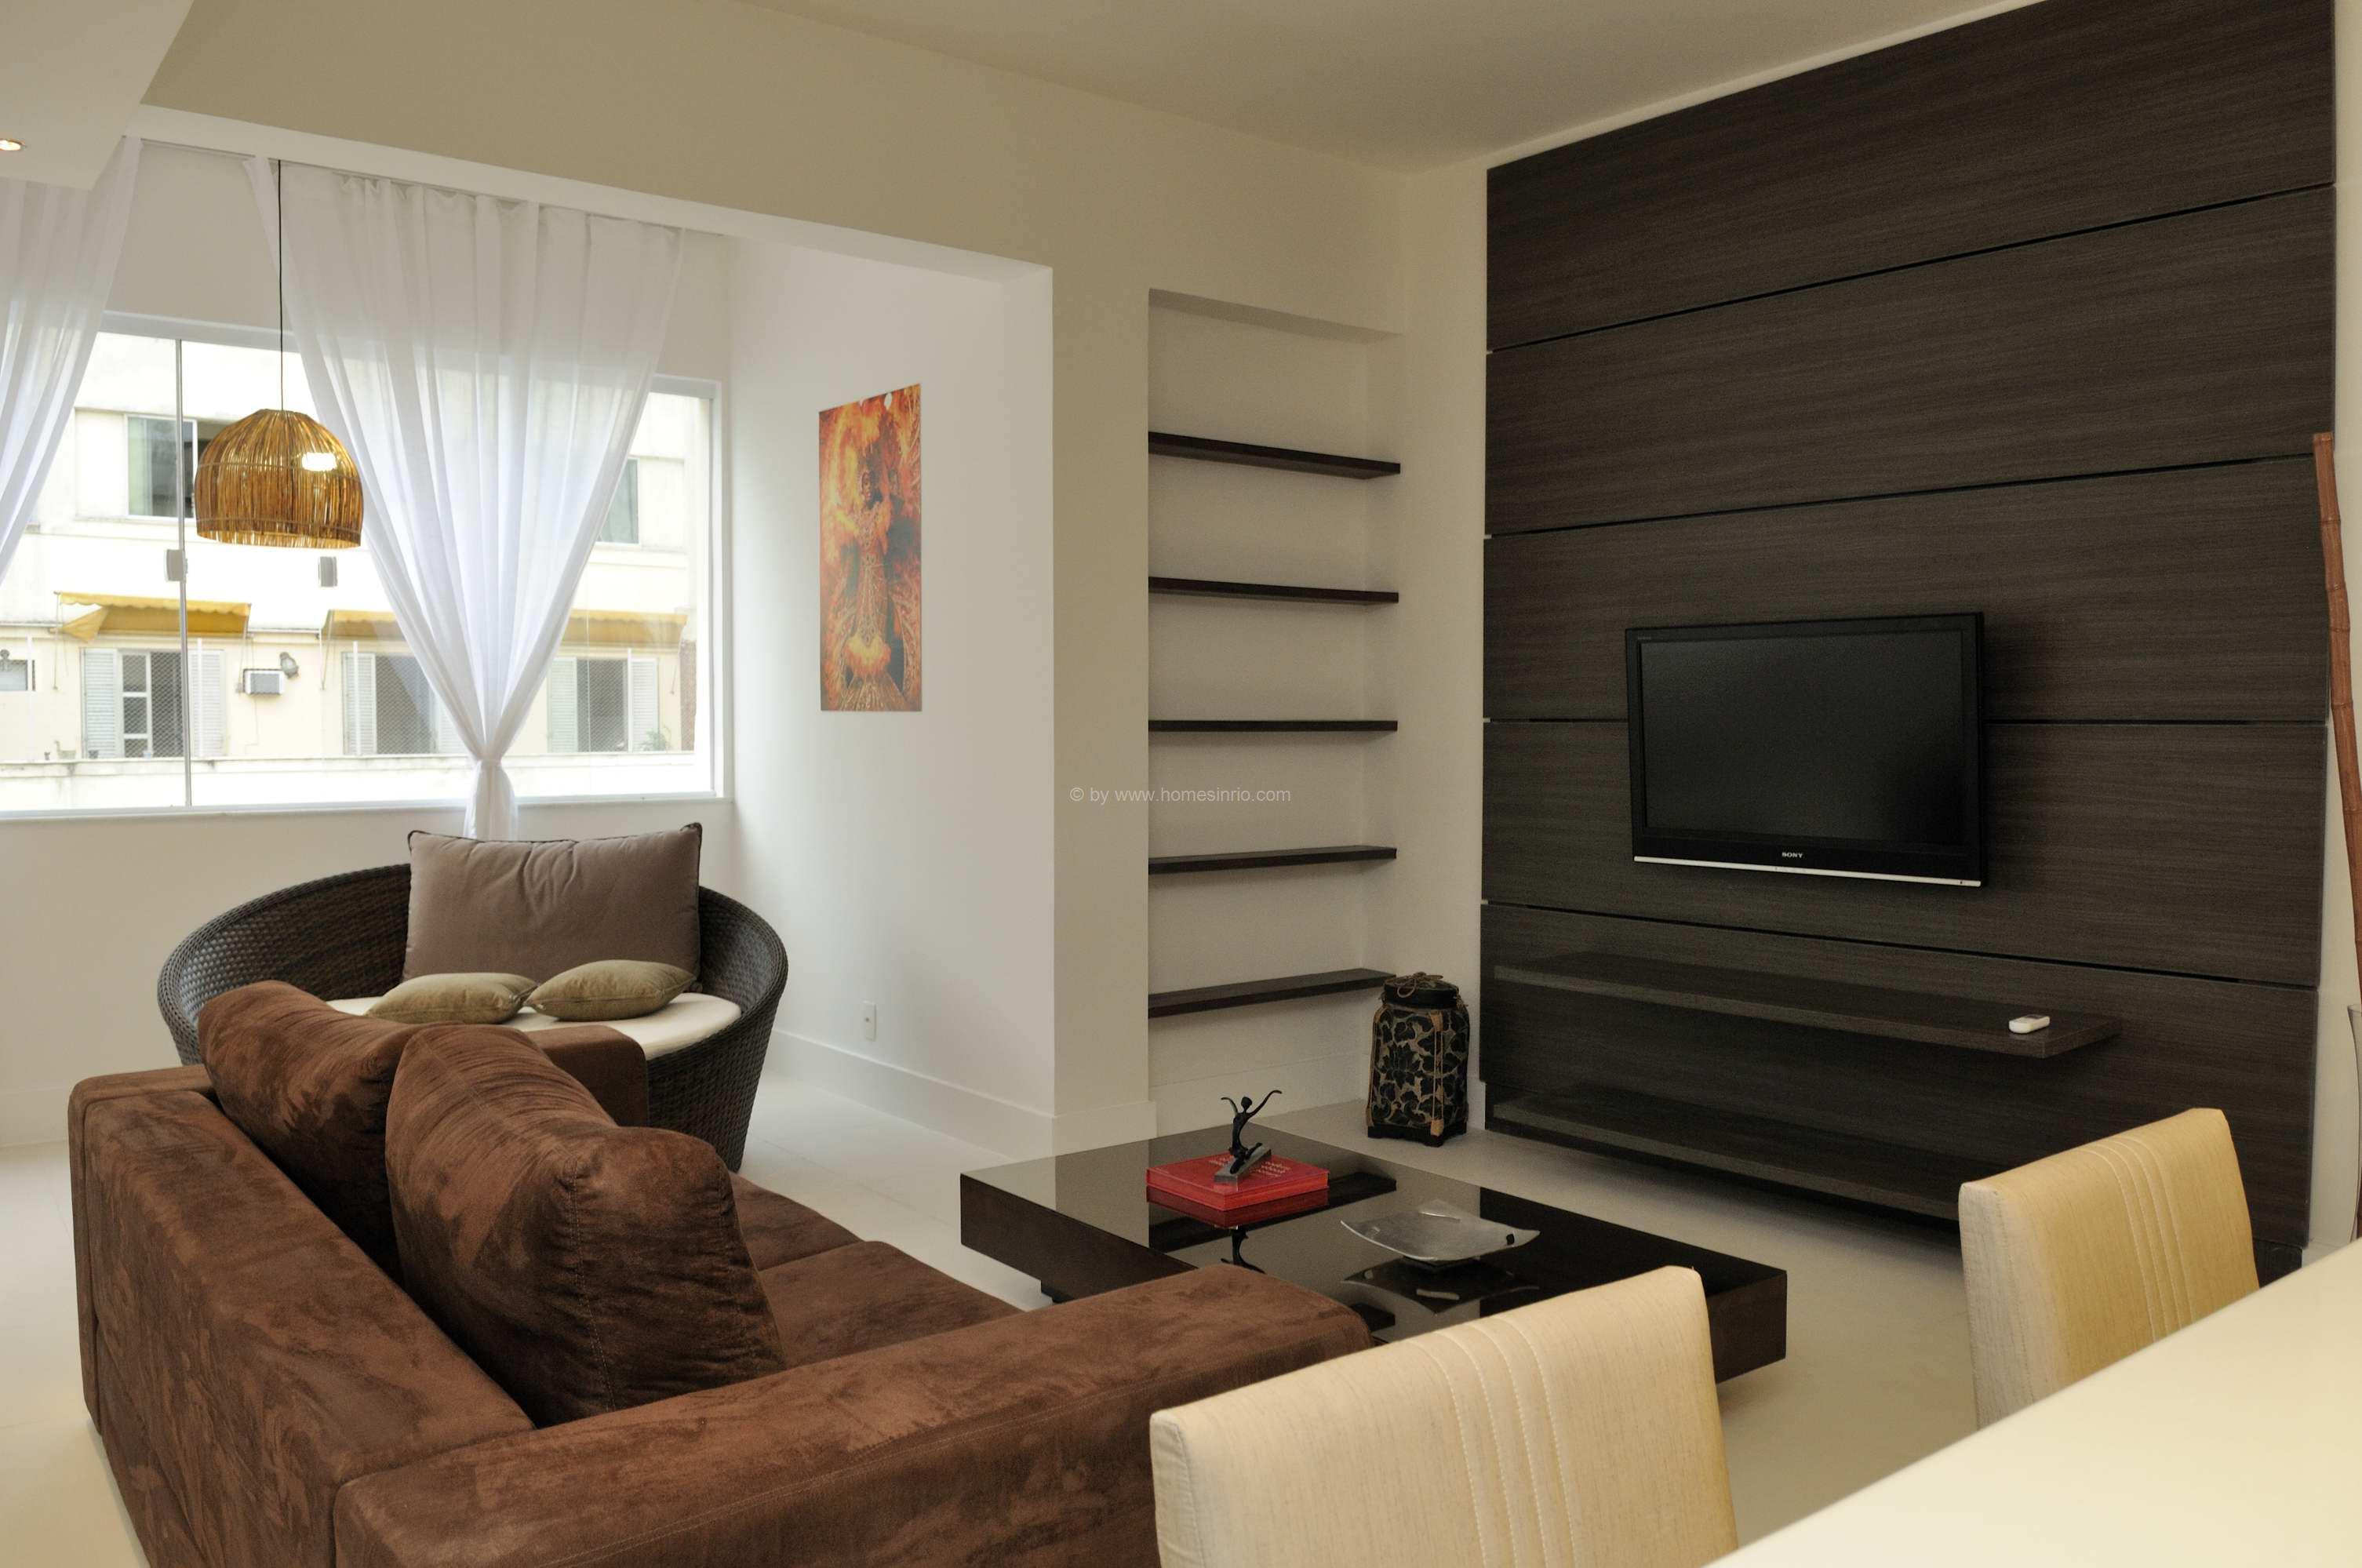 American Furniture Rental Delaware Outdoor Designs Teak Furniture Home Designs Home Apartment